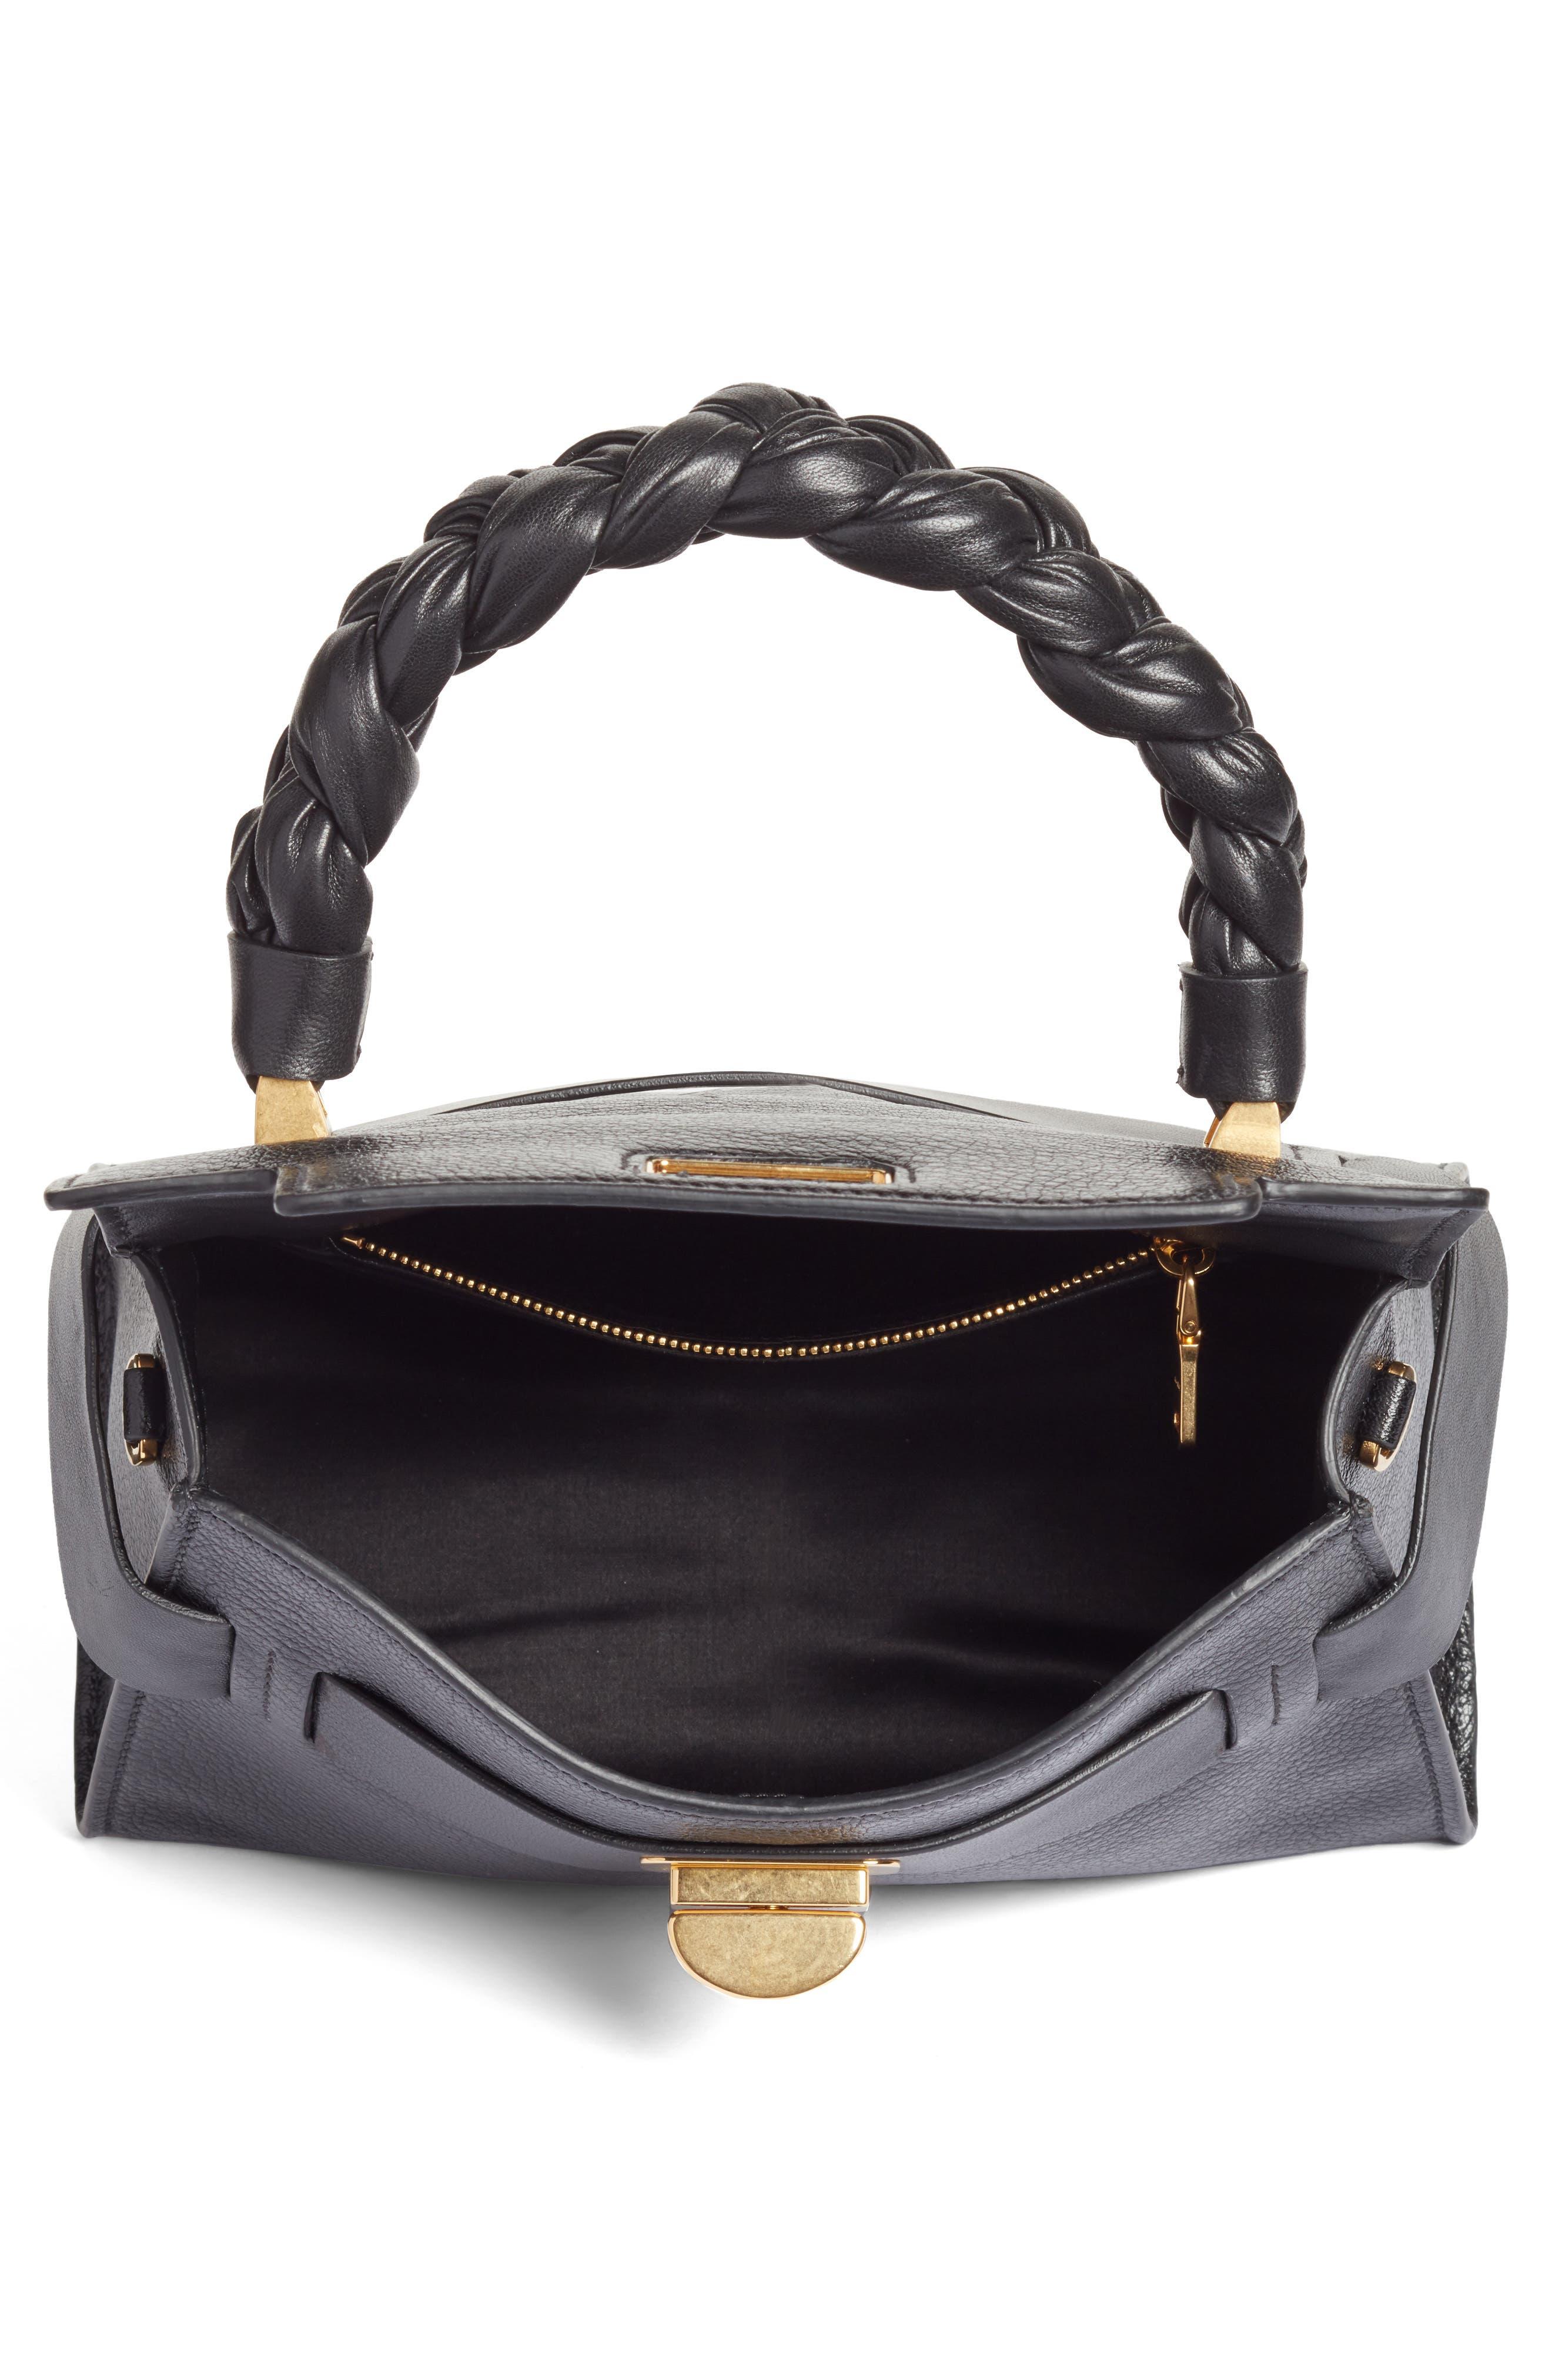 Madras Leather Top Handle Satchel,                             Alternate thumbnail 4, color,                             001